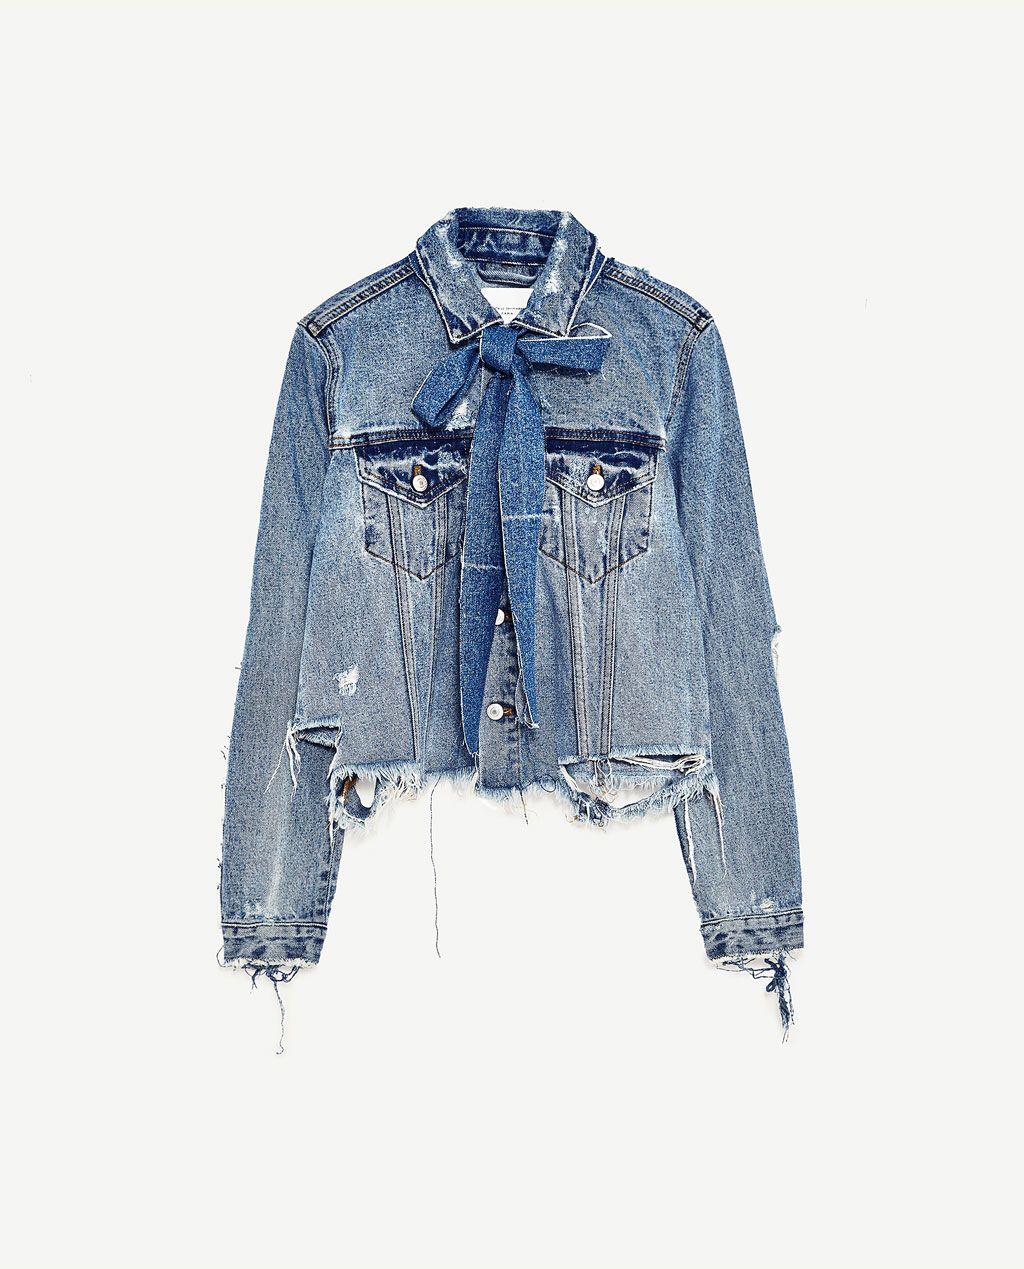 Pin By Keegan Carnahan On Clothes I Want Zara Denim Jacket Denim Jacket Denim Fashion Women